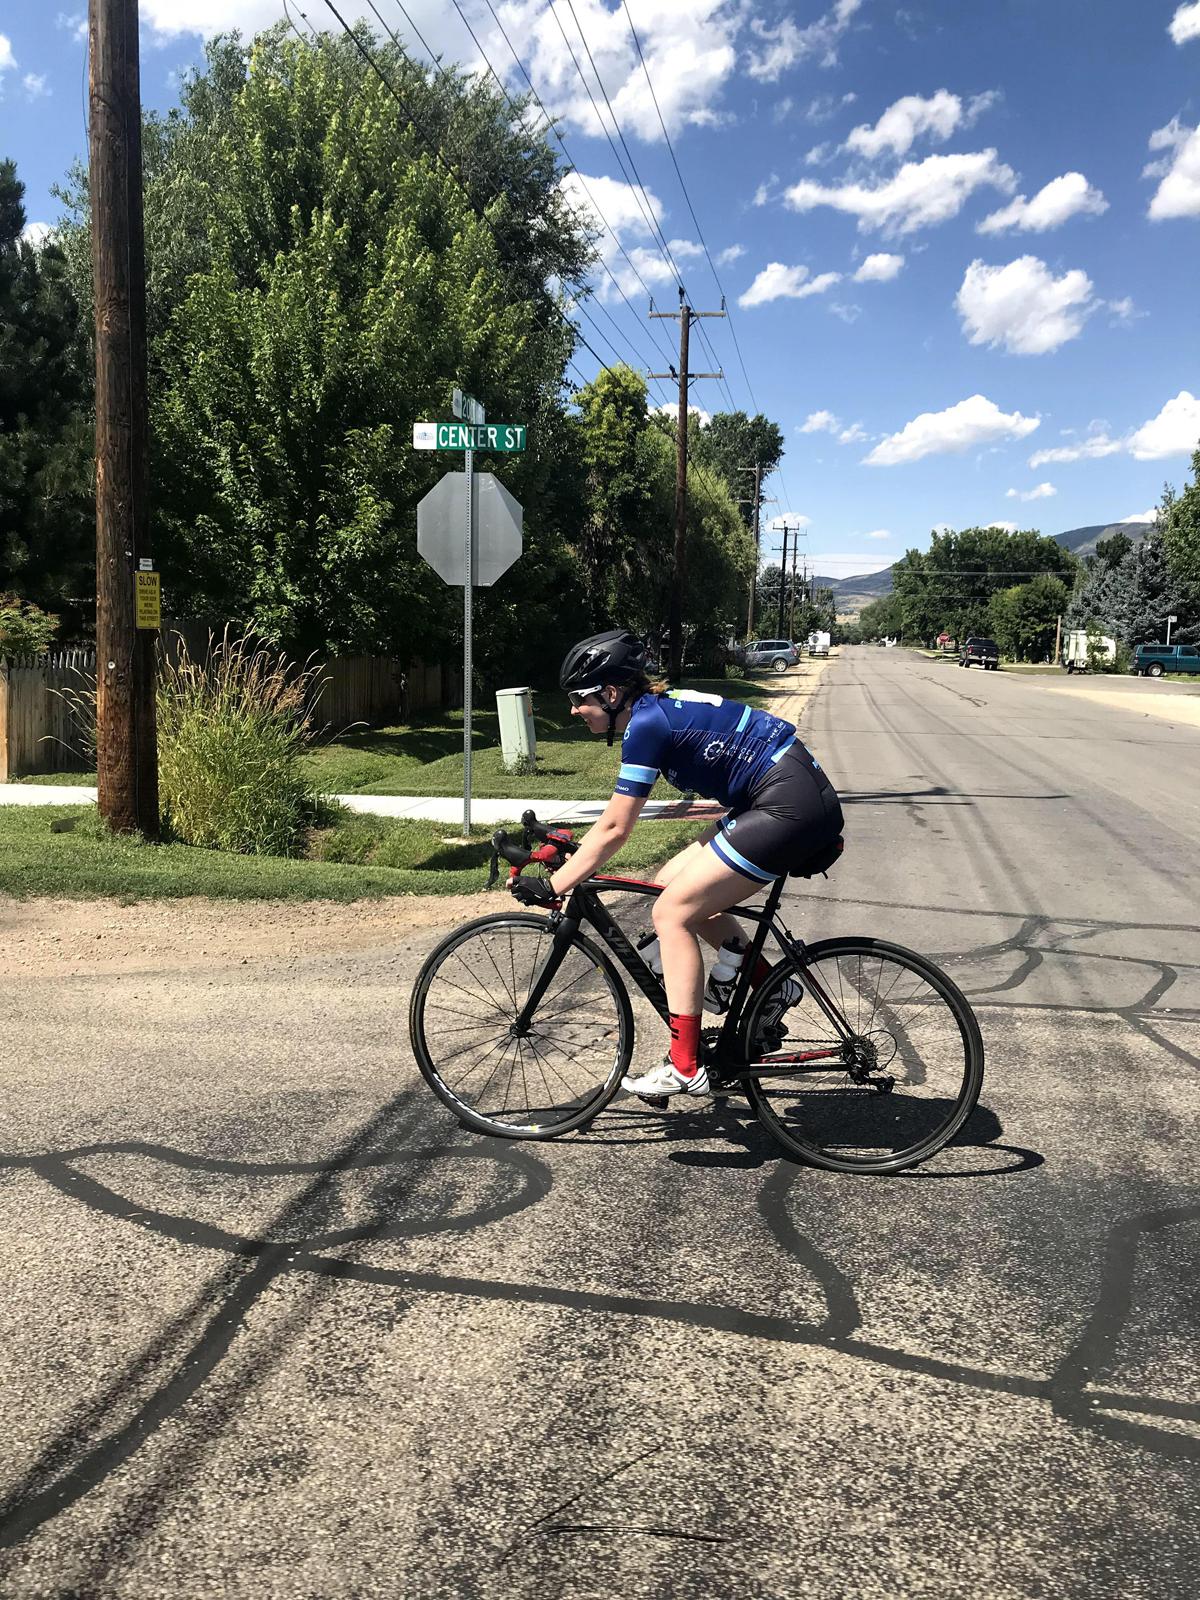 Jillian Gardner has been racing since age 11. Photo by Michael Finch